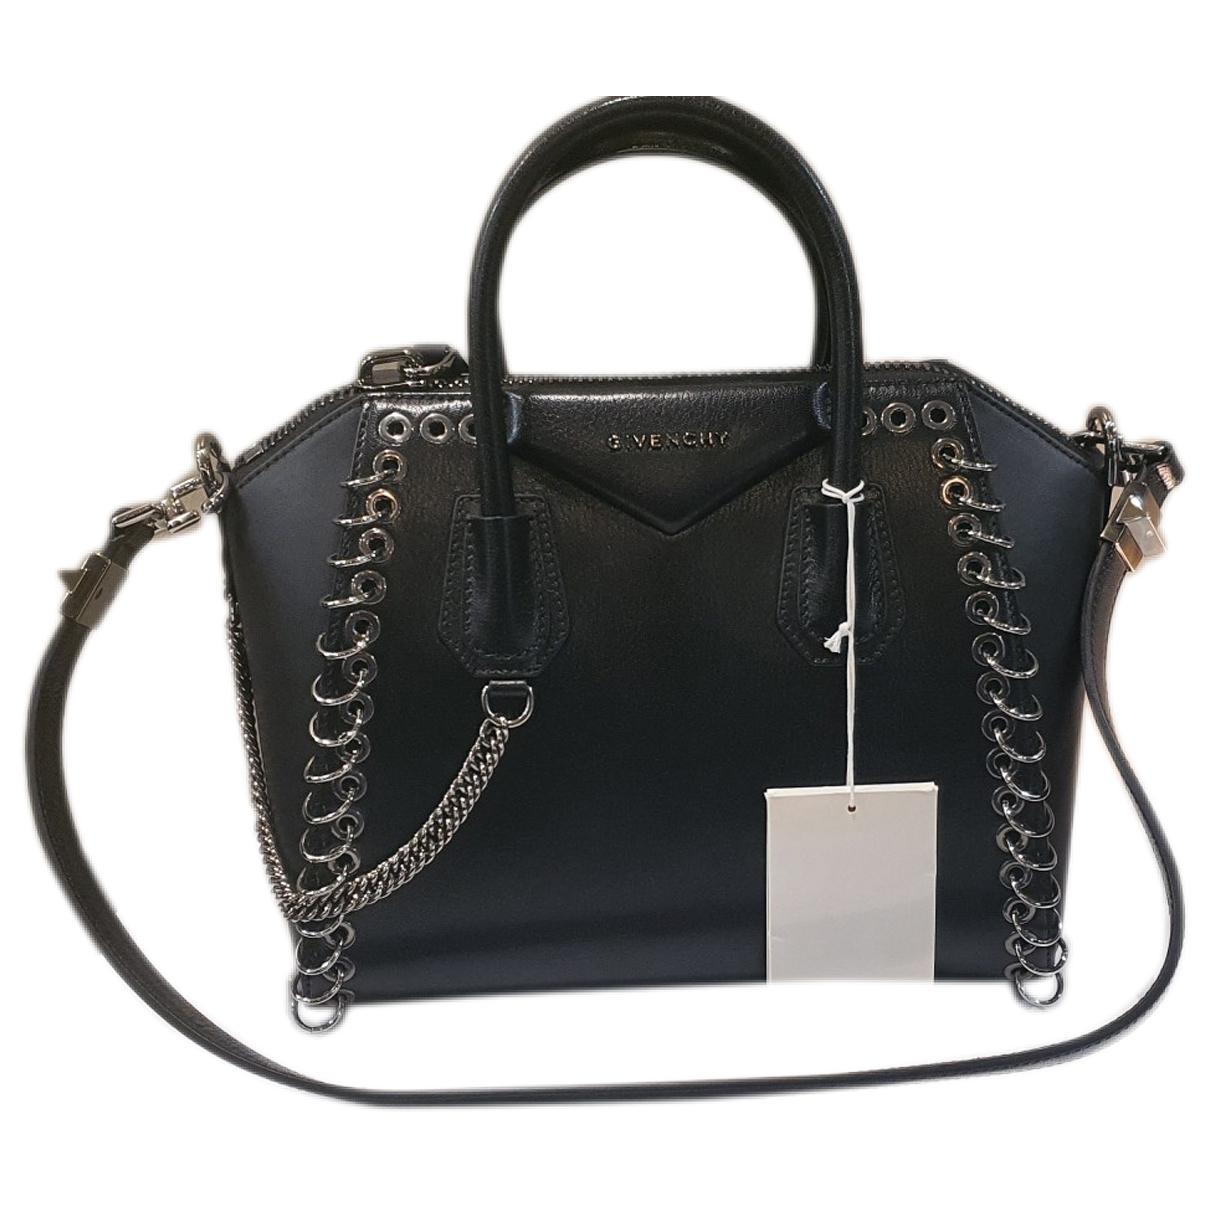 Givenchy - Sac a main Antigona pour femme en cuir - noir